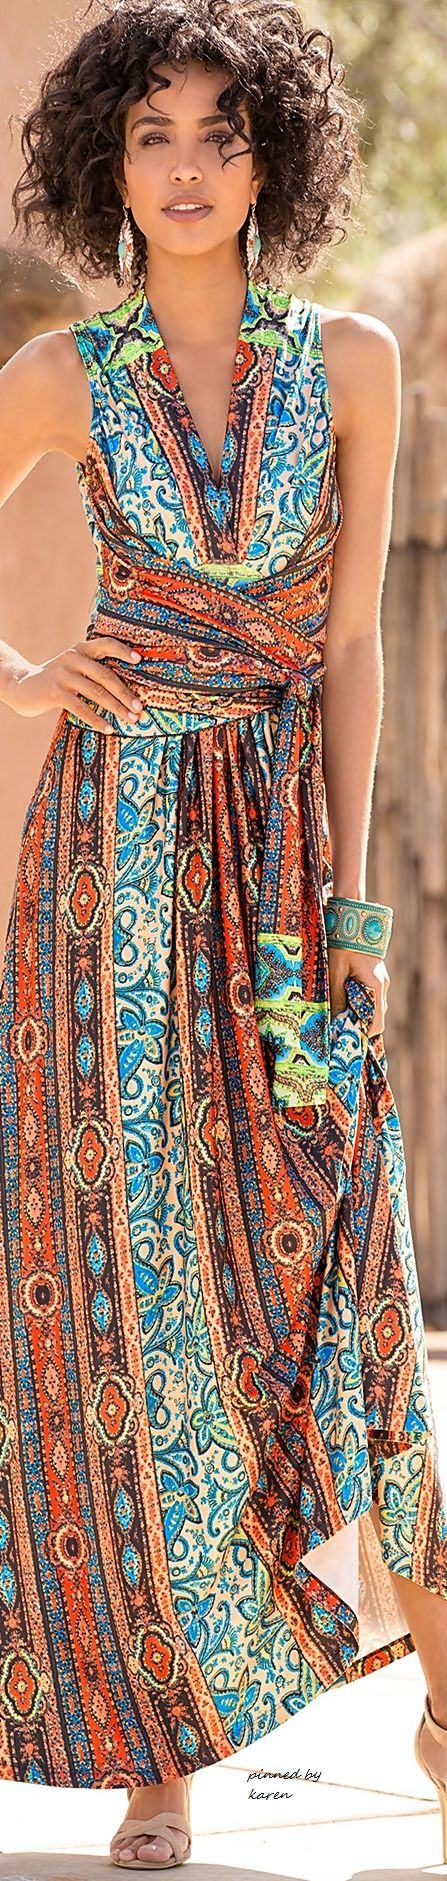 Diamond Cowgirl ~ Southwestern Style                                                                                                                                                                                 More